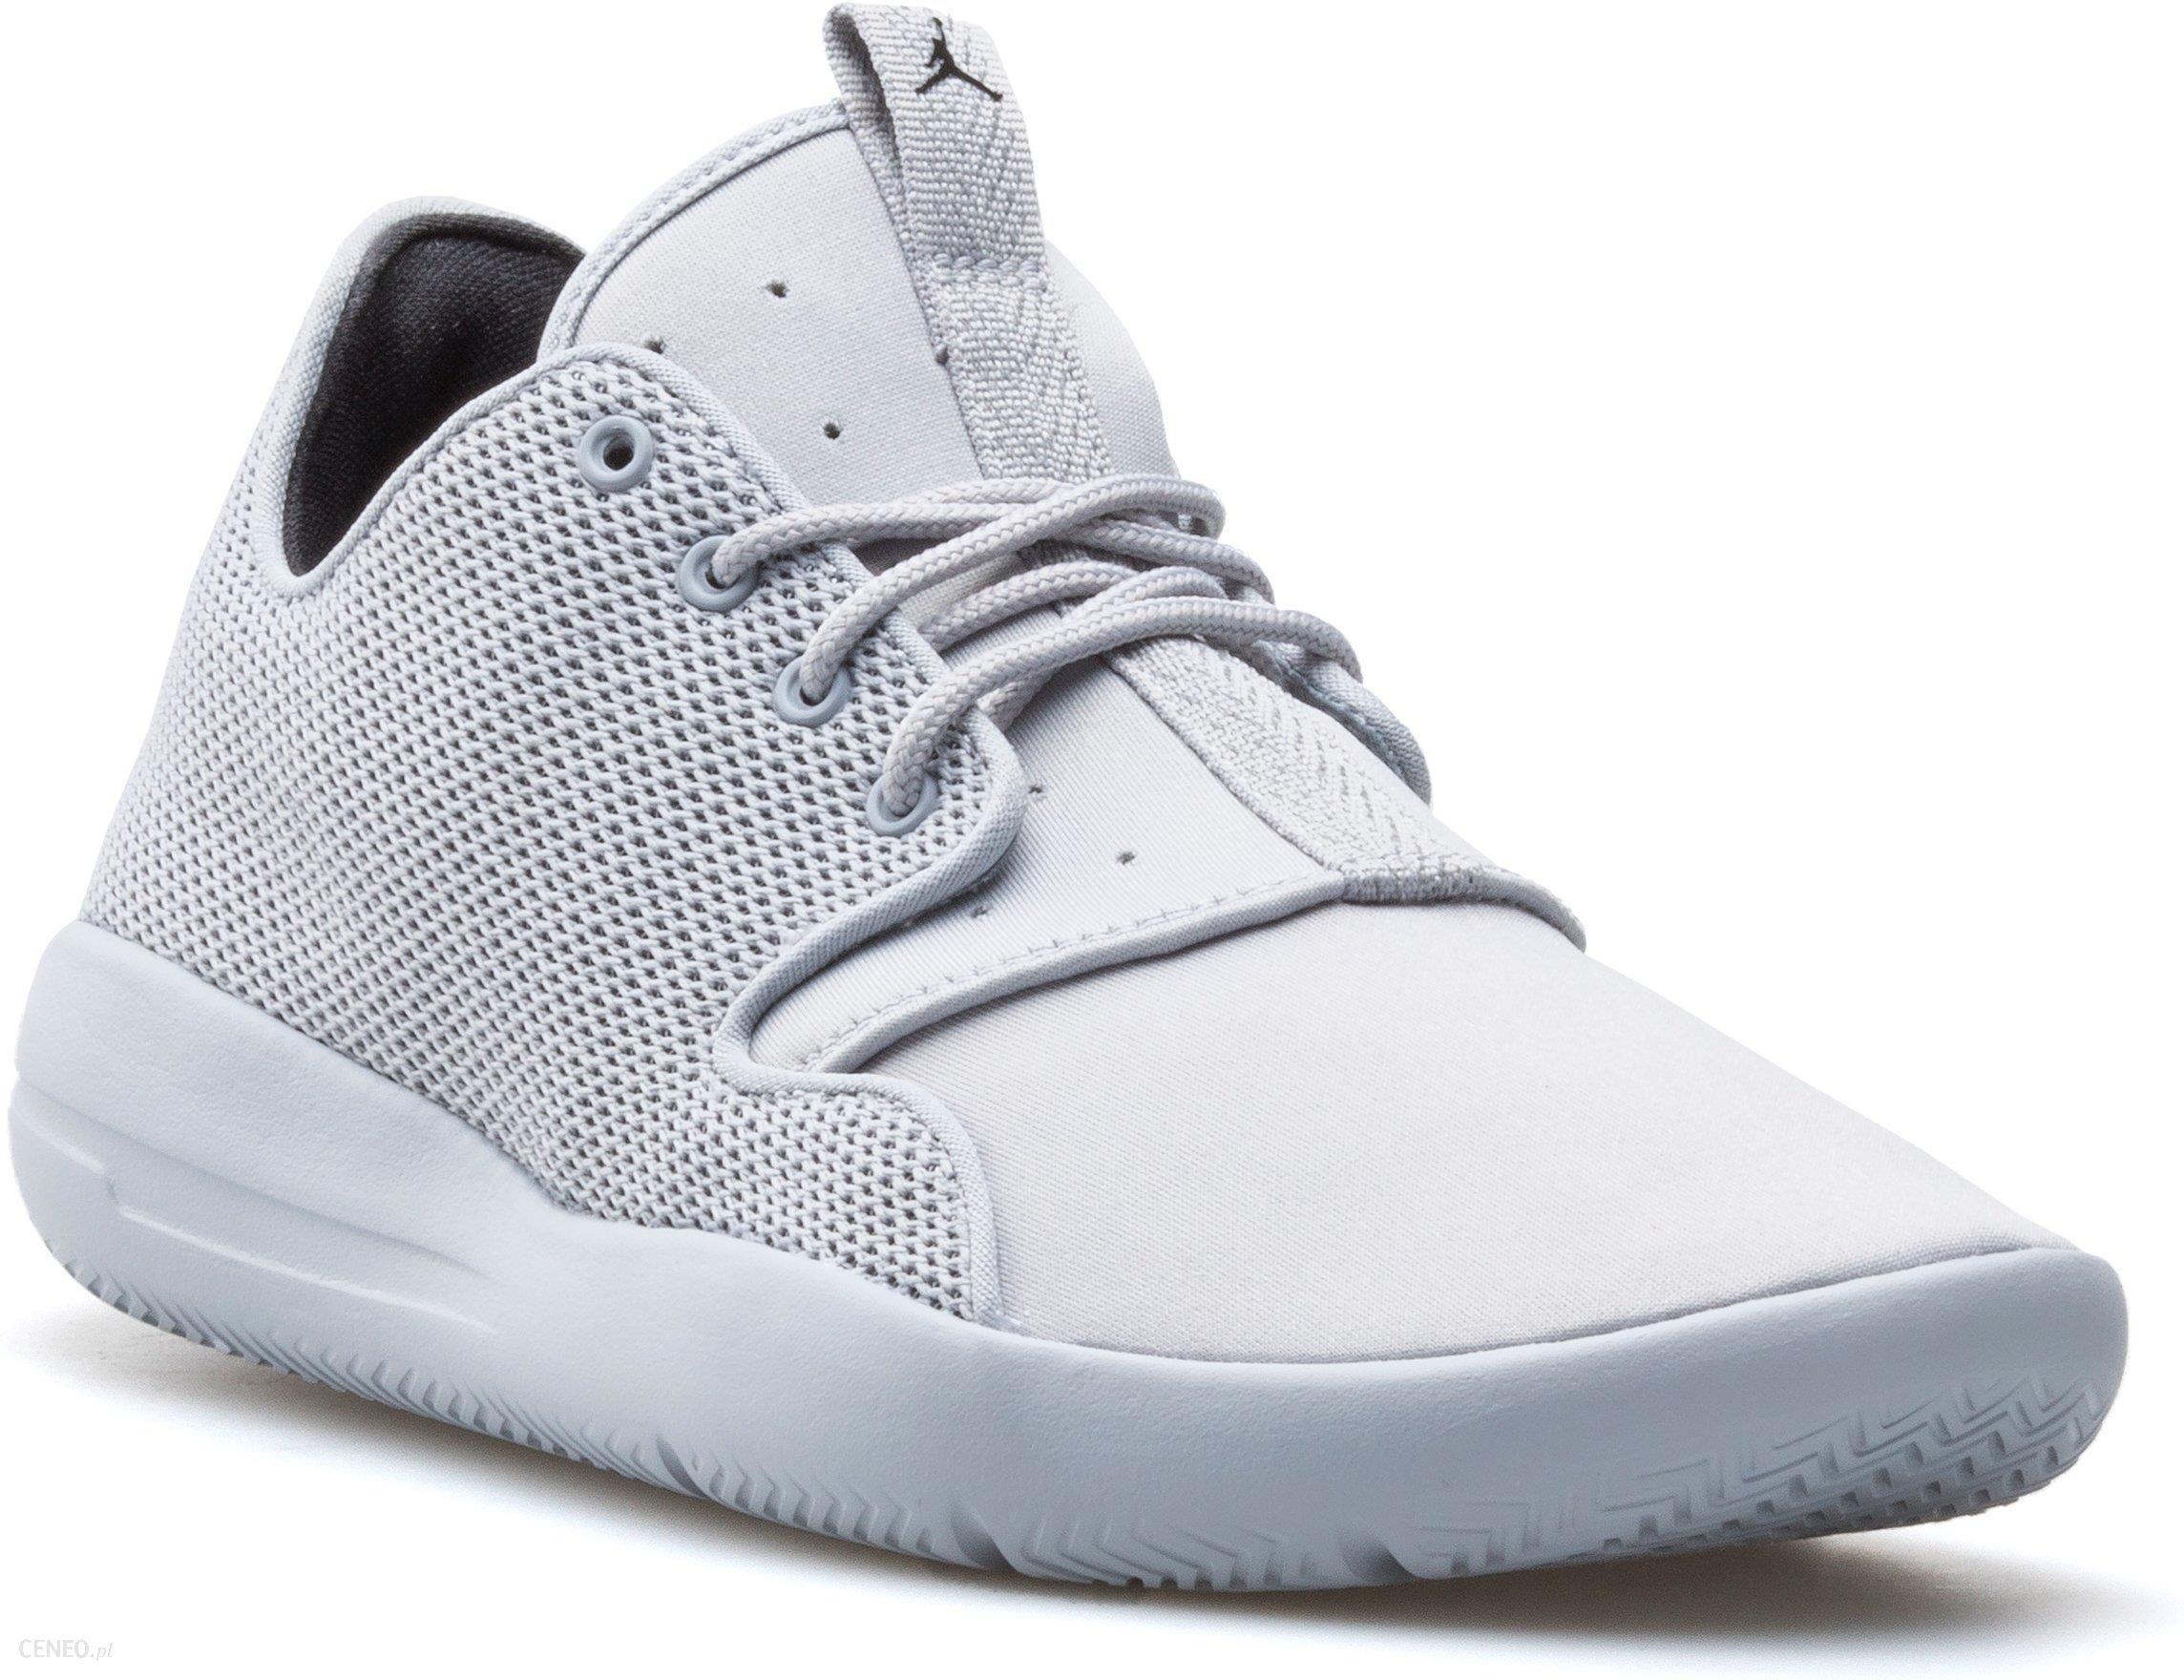 sneakers for cheap 91585 5cc8b Buty Nike Jordan Eclipse Bg 724042-004 r. 37,5 - zdjęcie 1